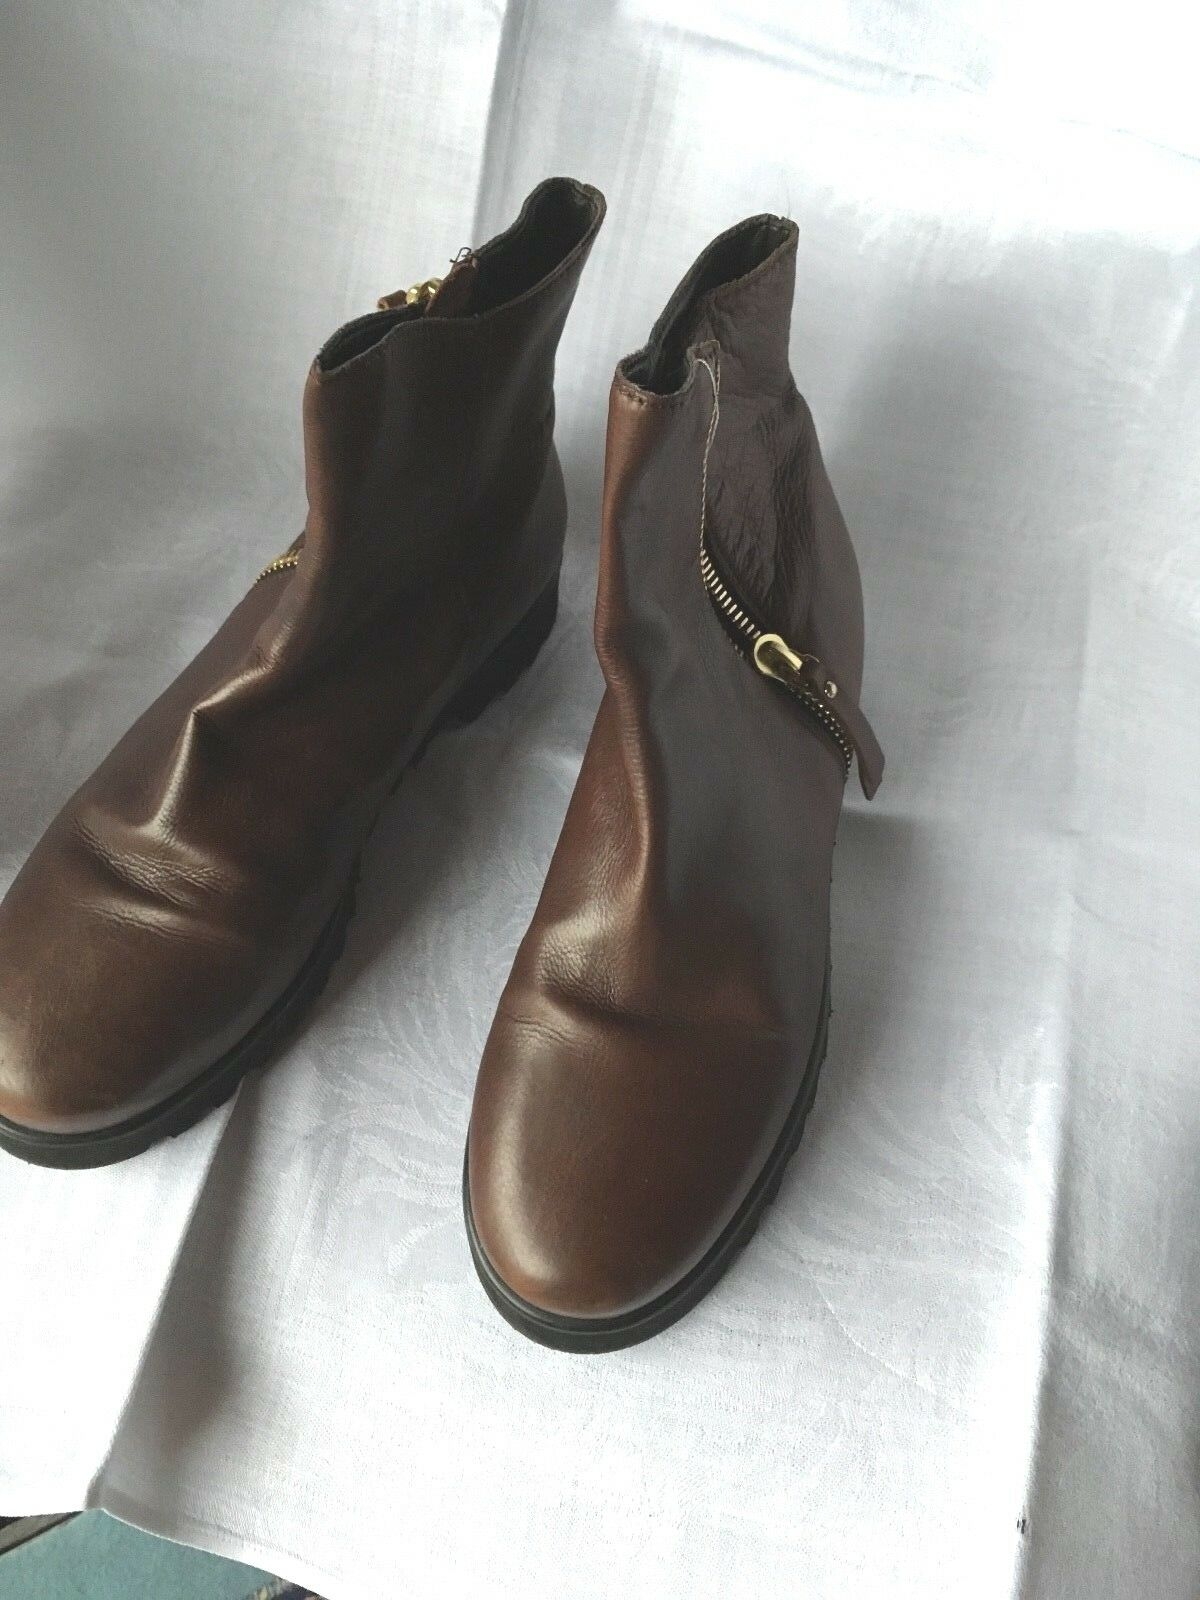 Booties mit  Echtleder Vibram Sohle 1 x getragen braunes Echtleder  Gr 38,5 18cd44